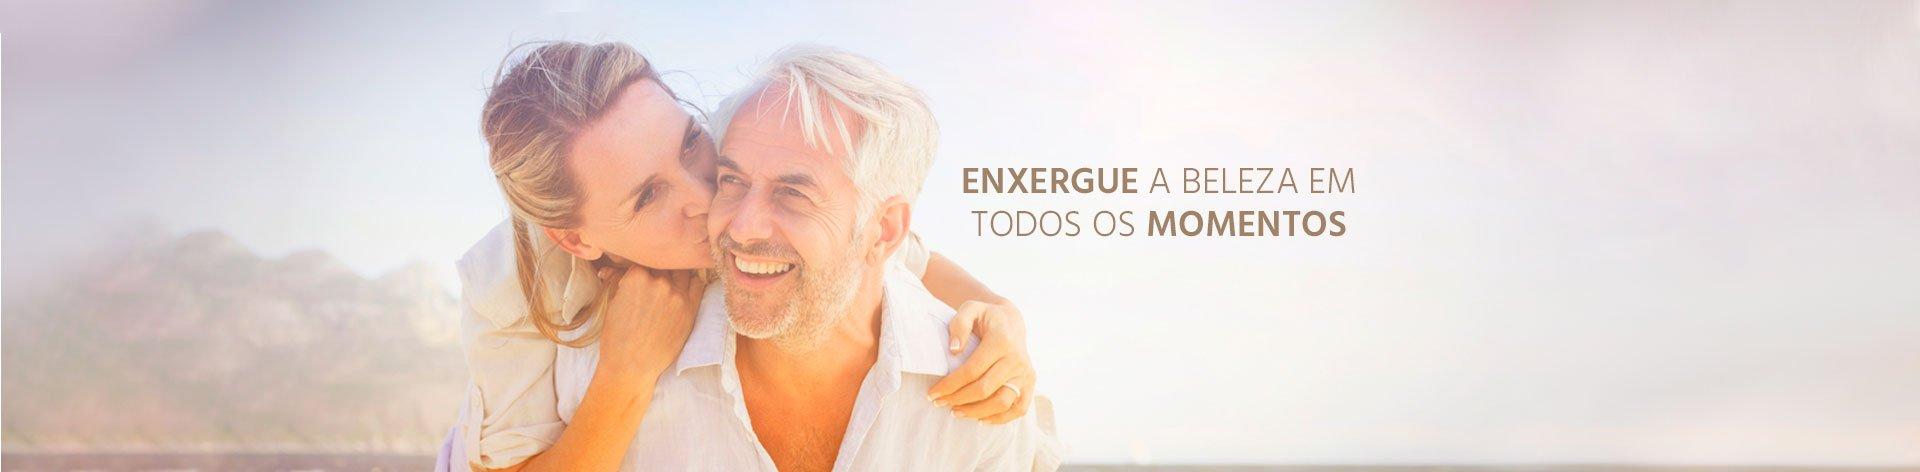 Marcelo Paglioli Oftalmologia Avançada